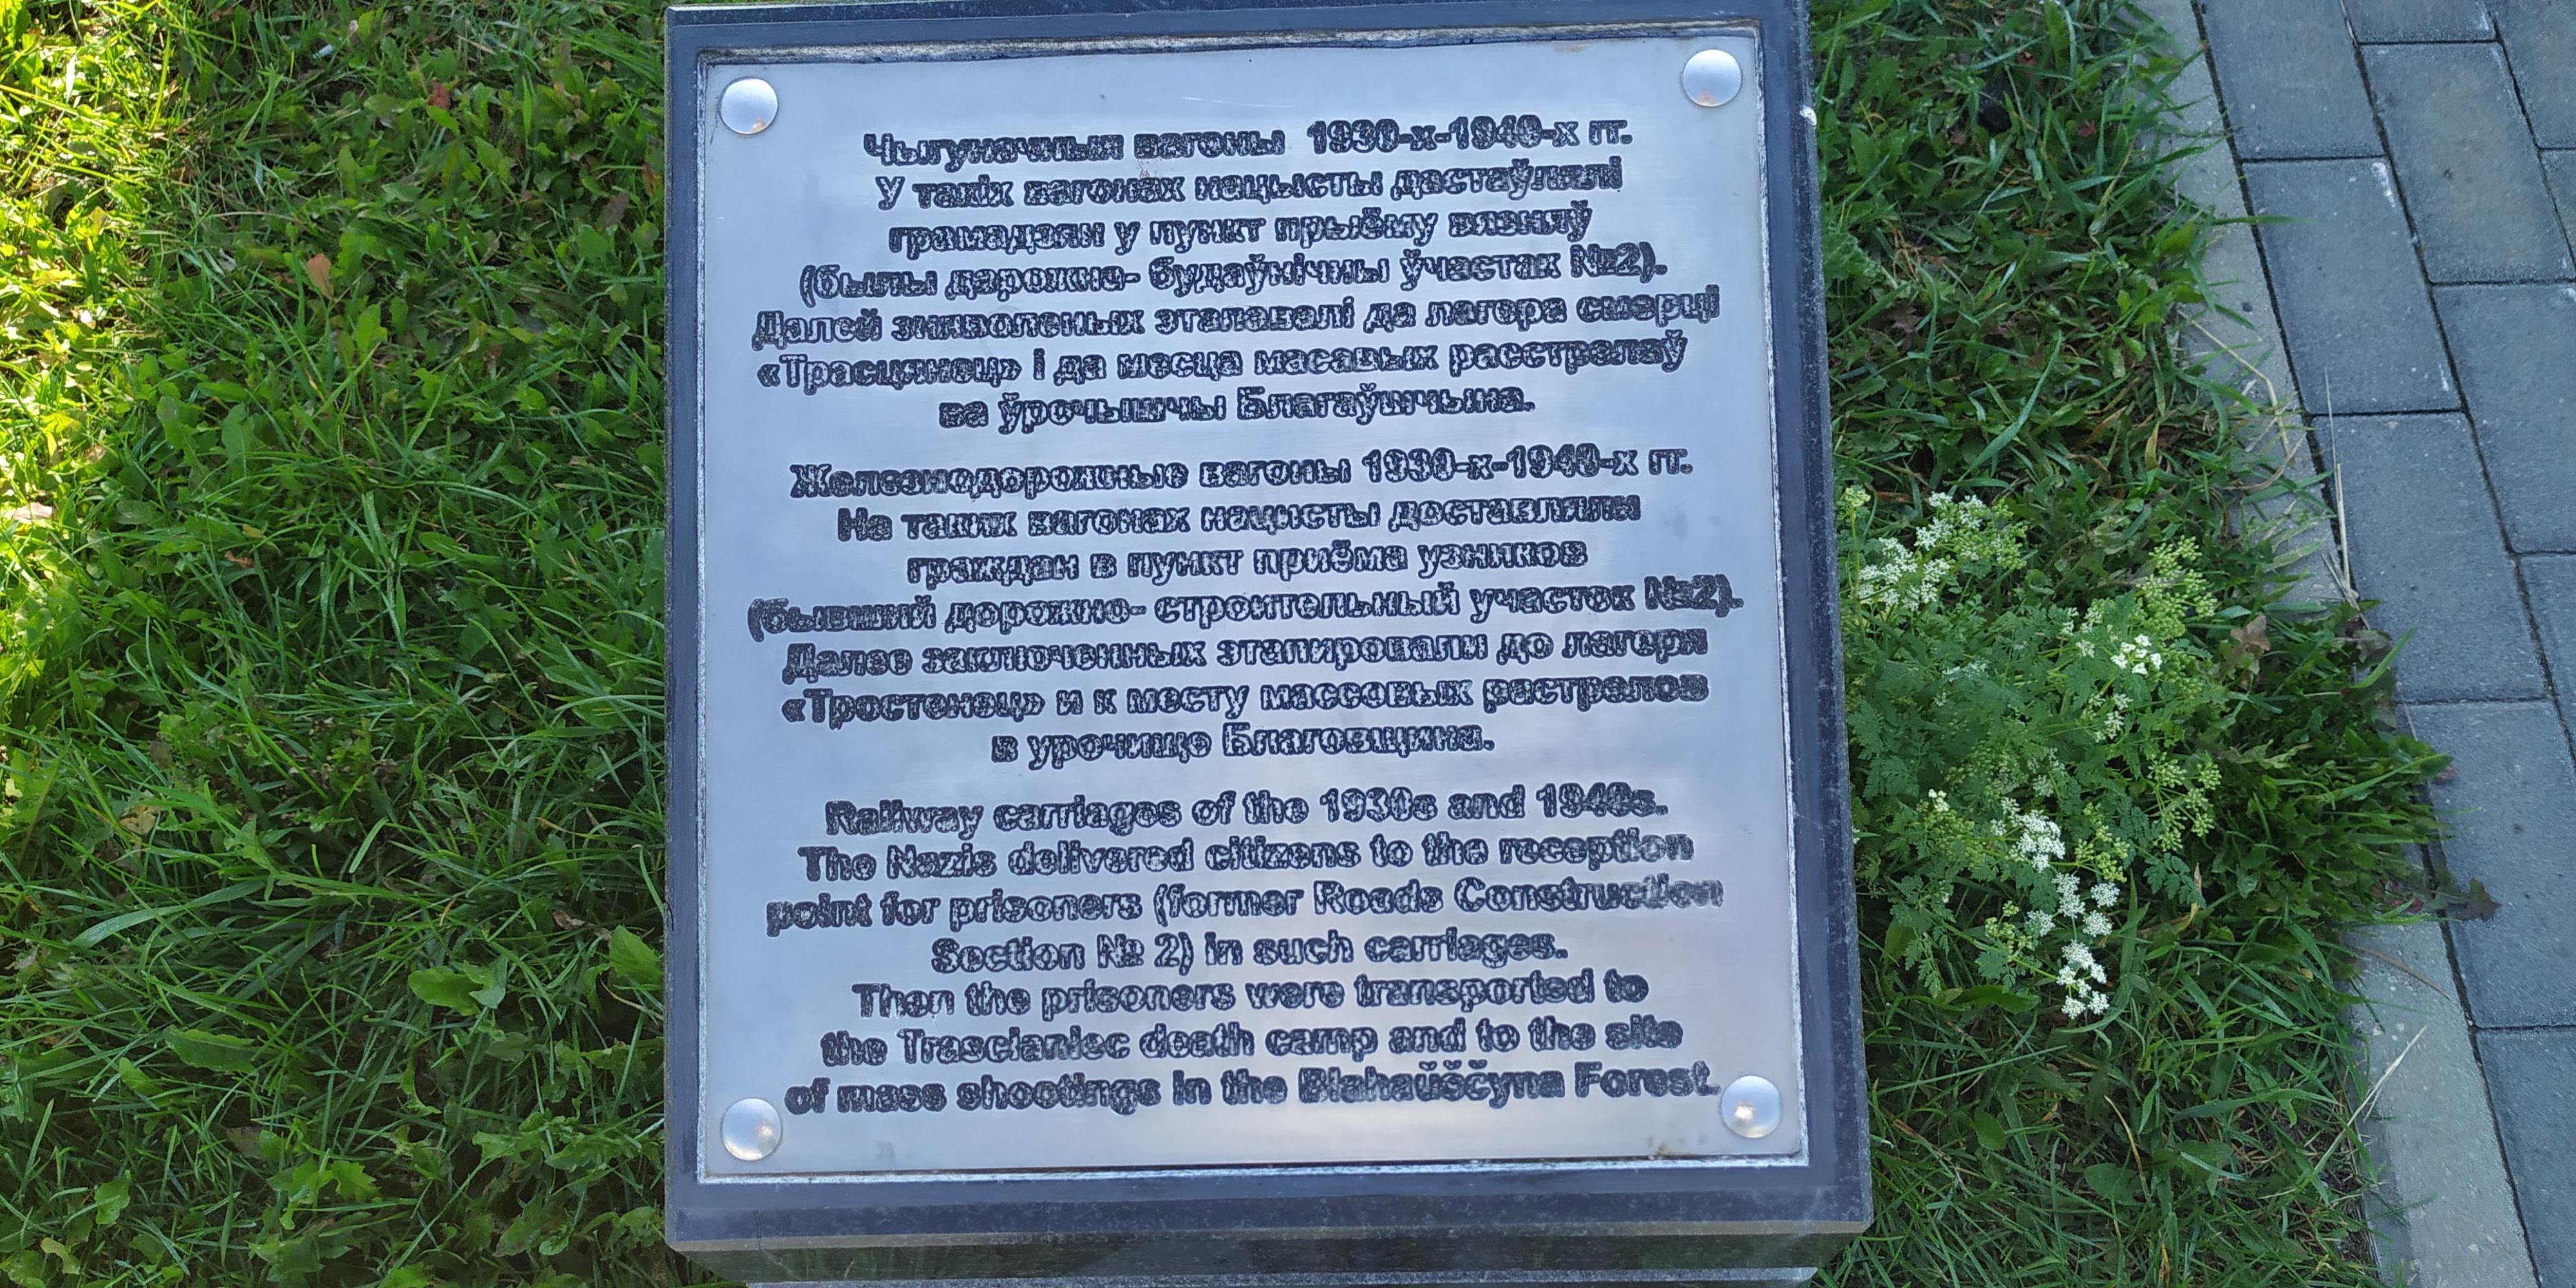 Read the Commemorative plaques